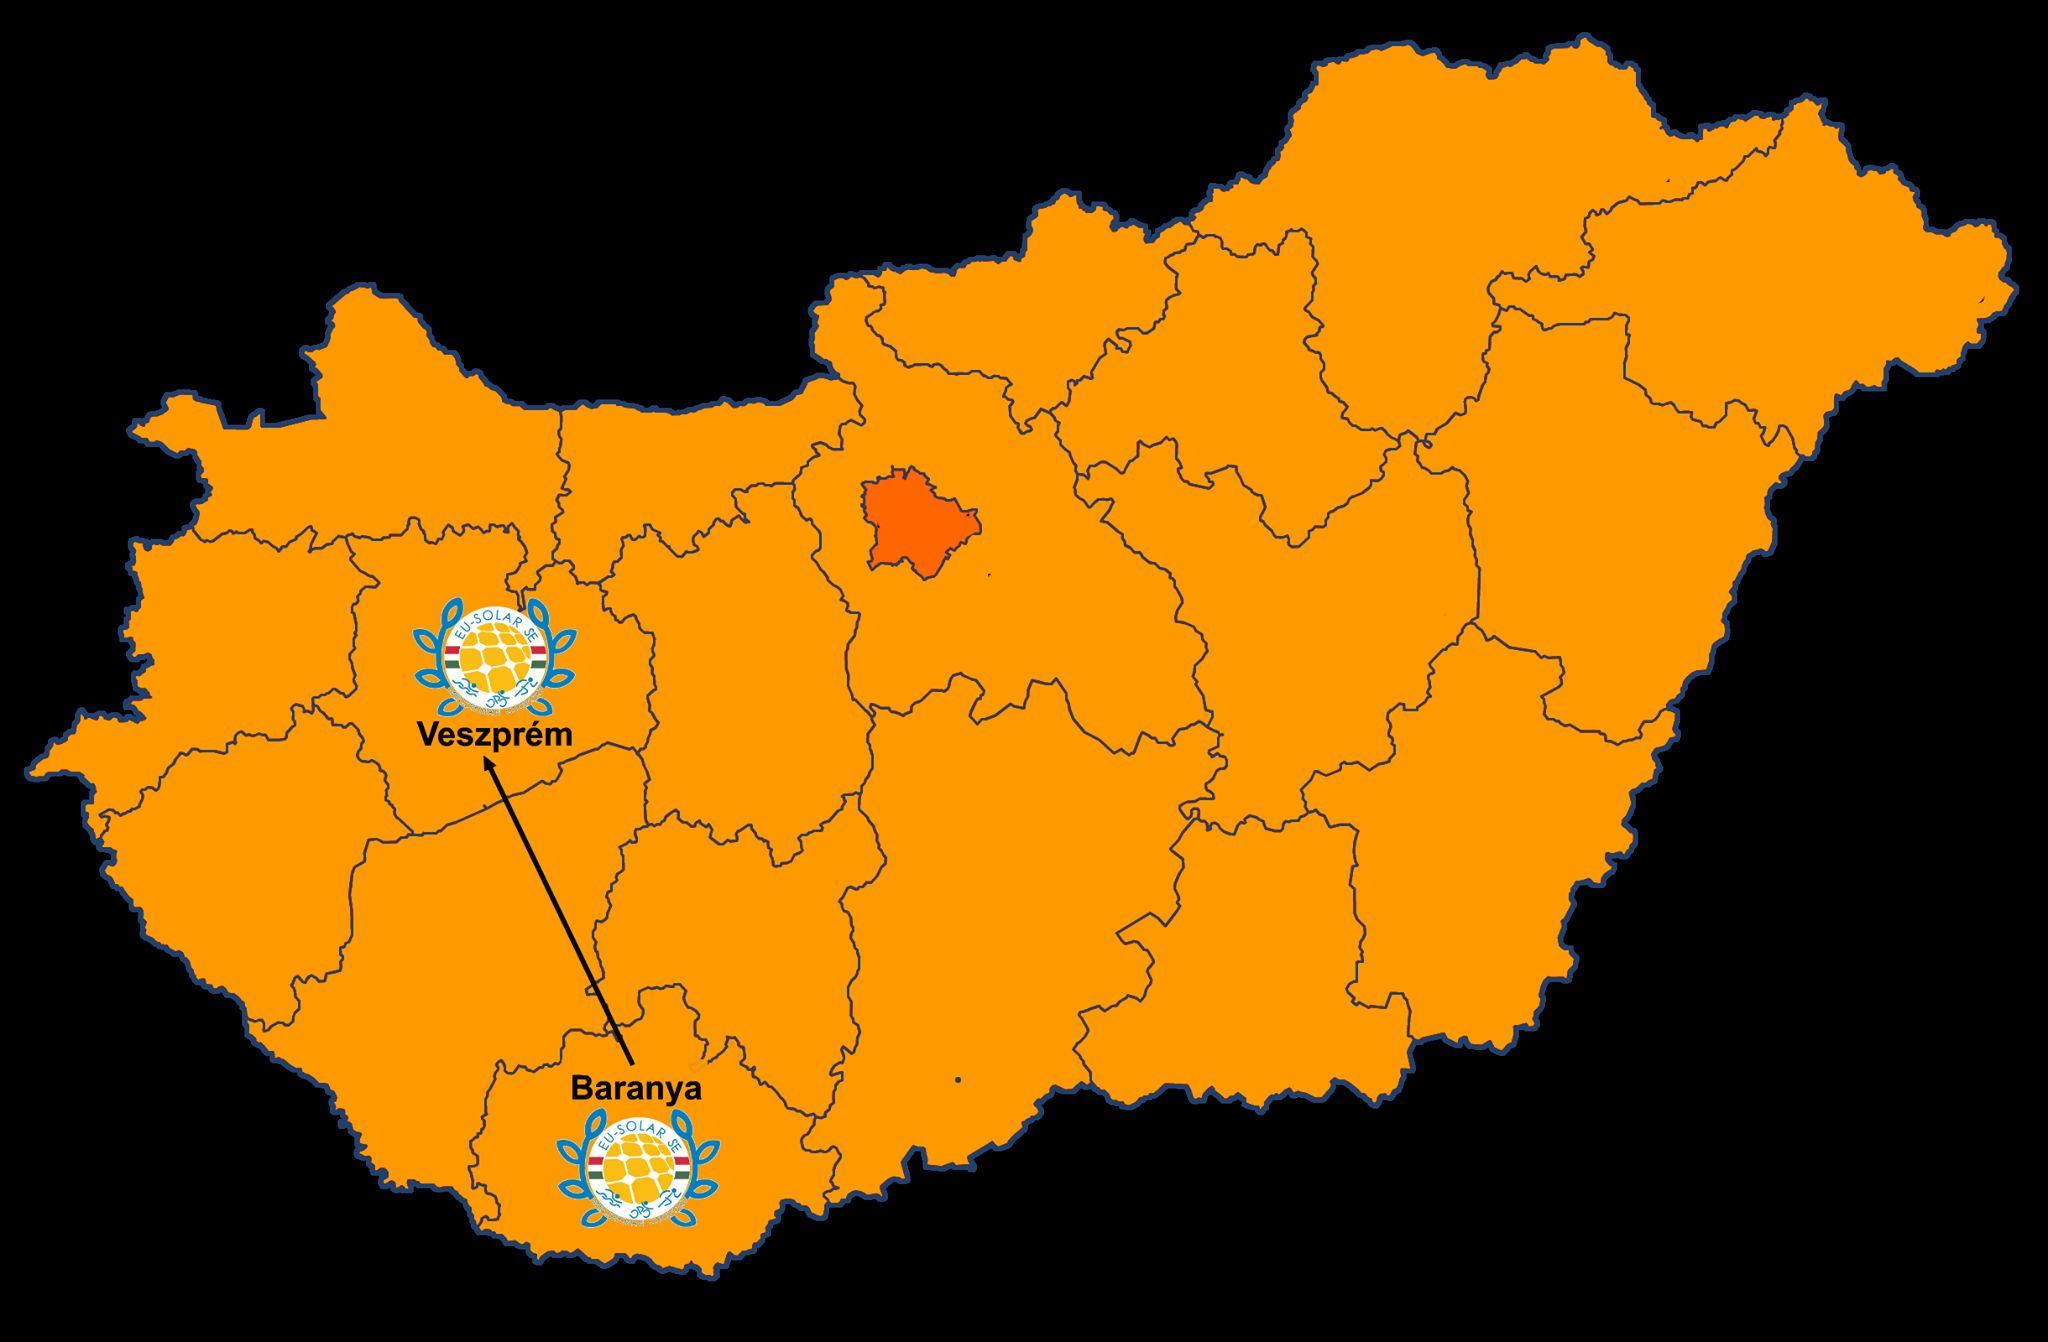 Baranya-Veszprém